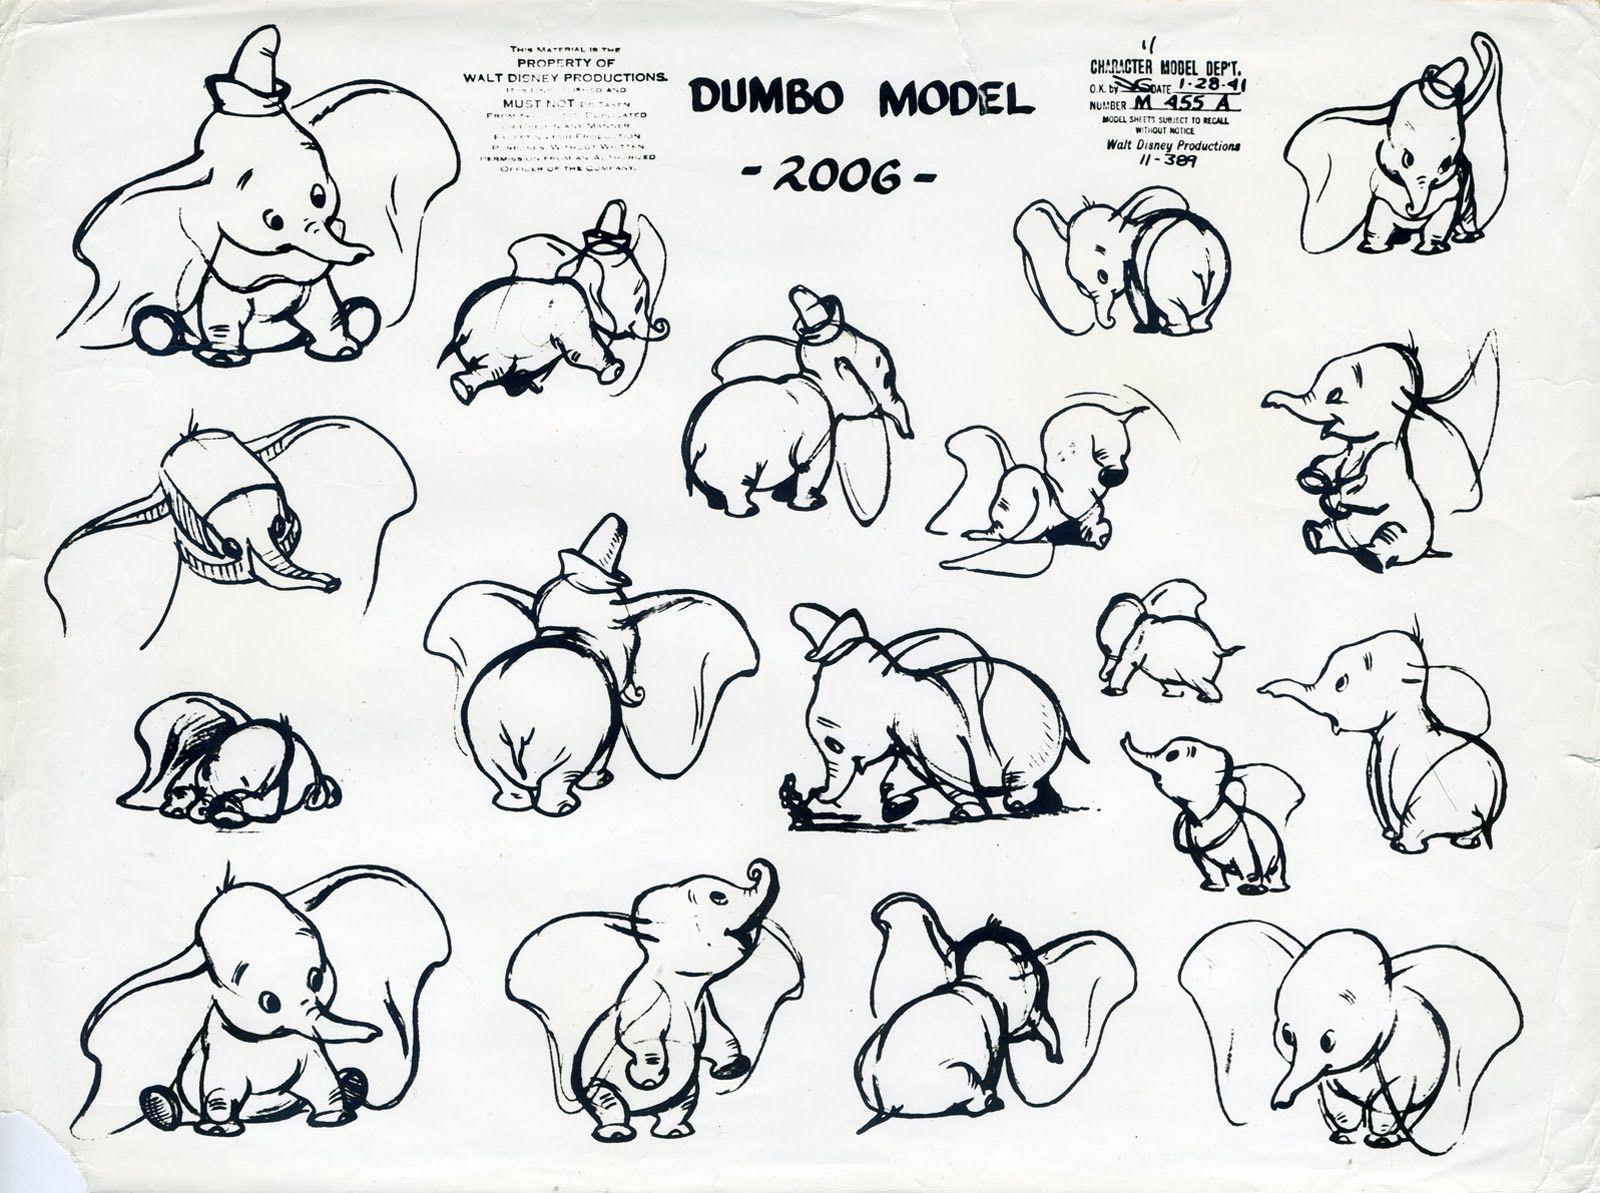 Dibujo Para Colorear Del Elefante Dumbo De La Película De: Model Sheet For Dumbo From Disney's Dumbo